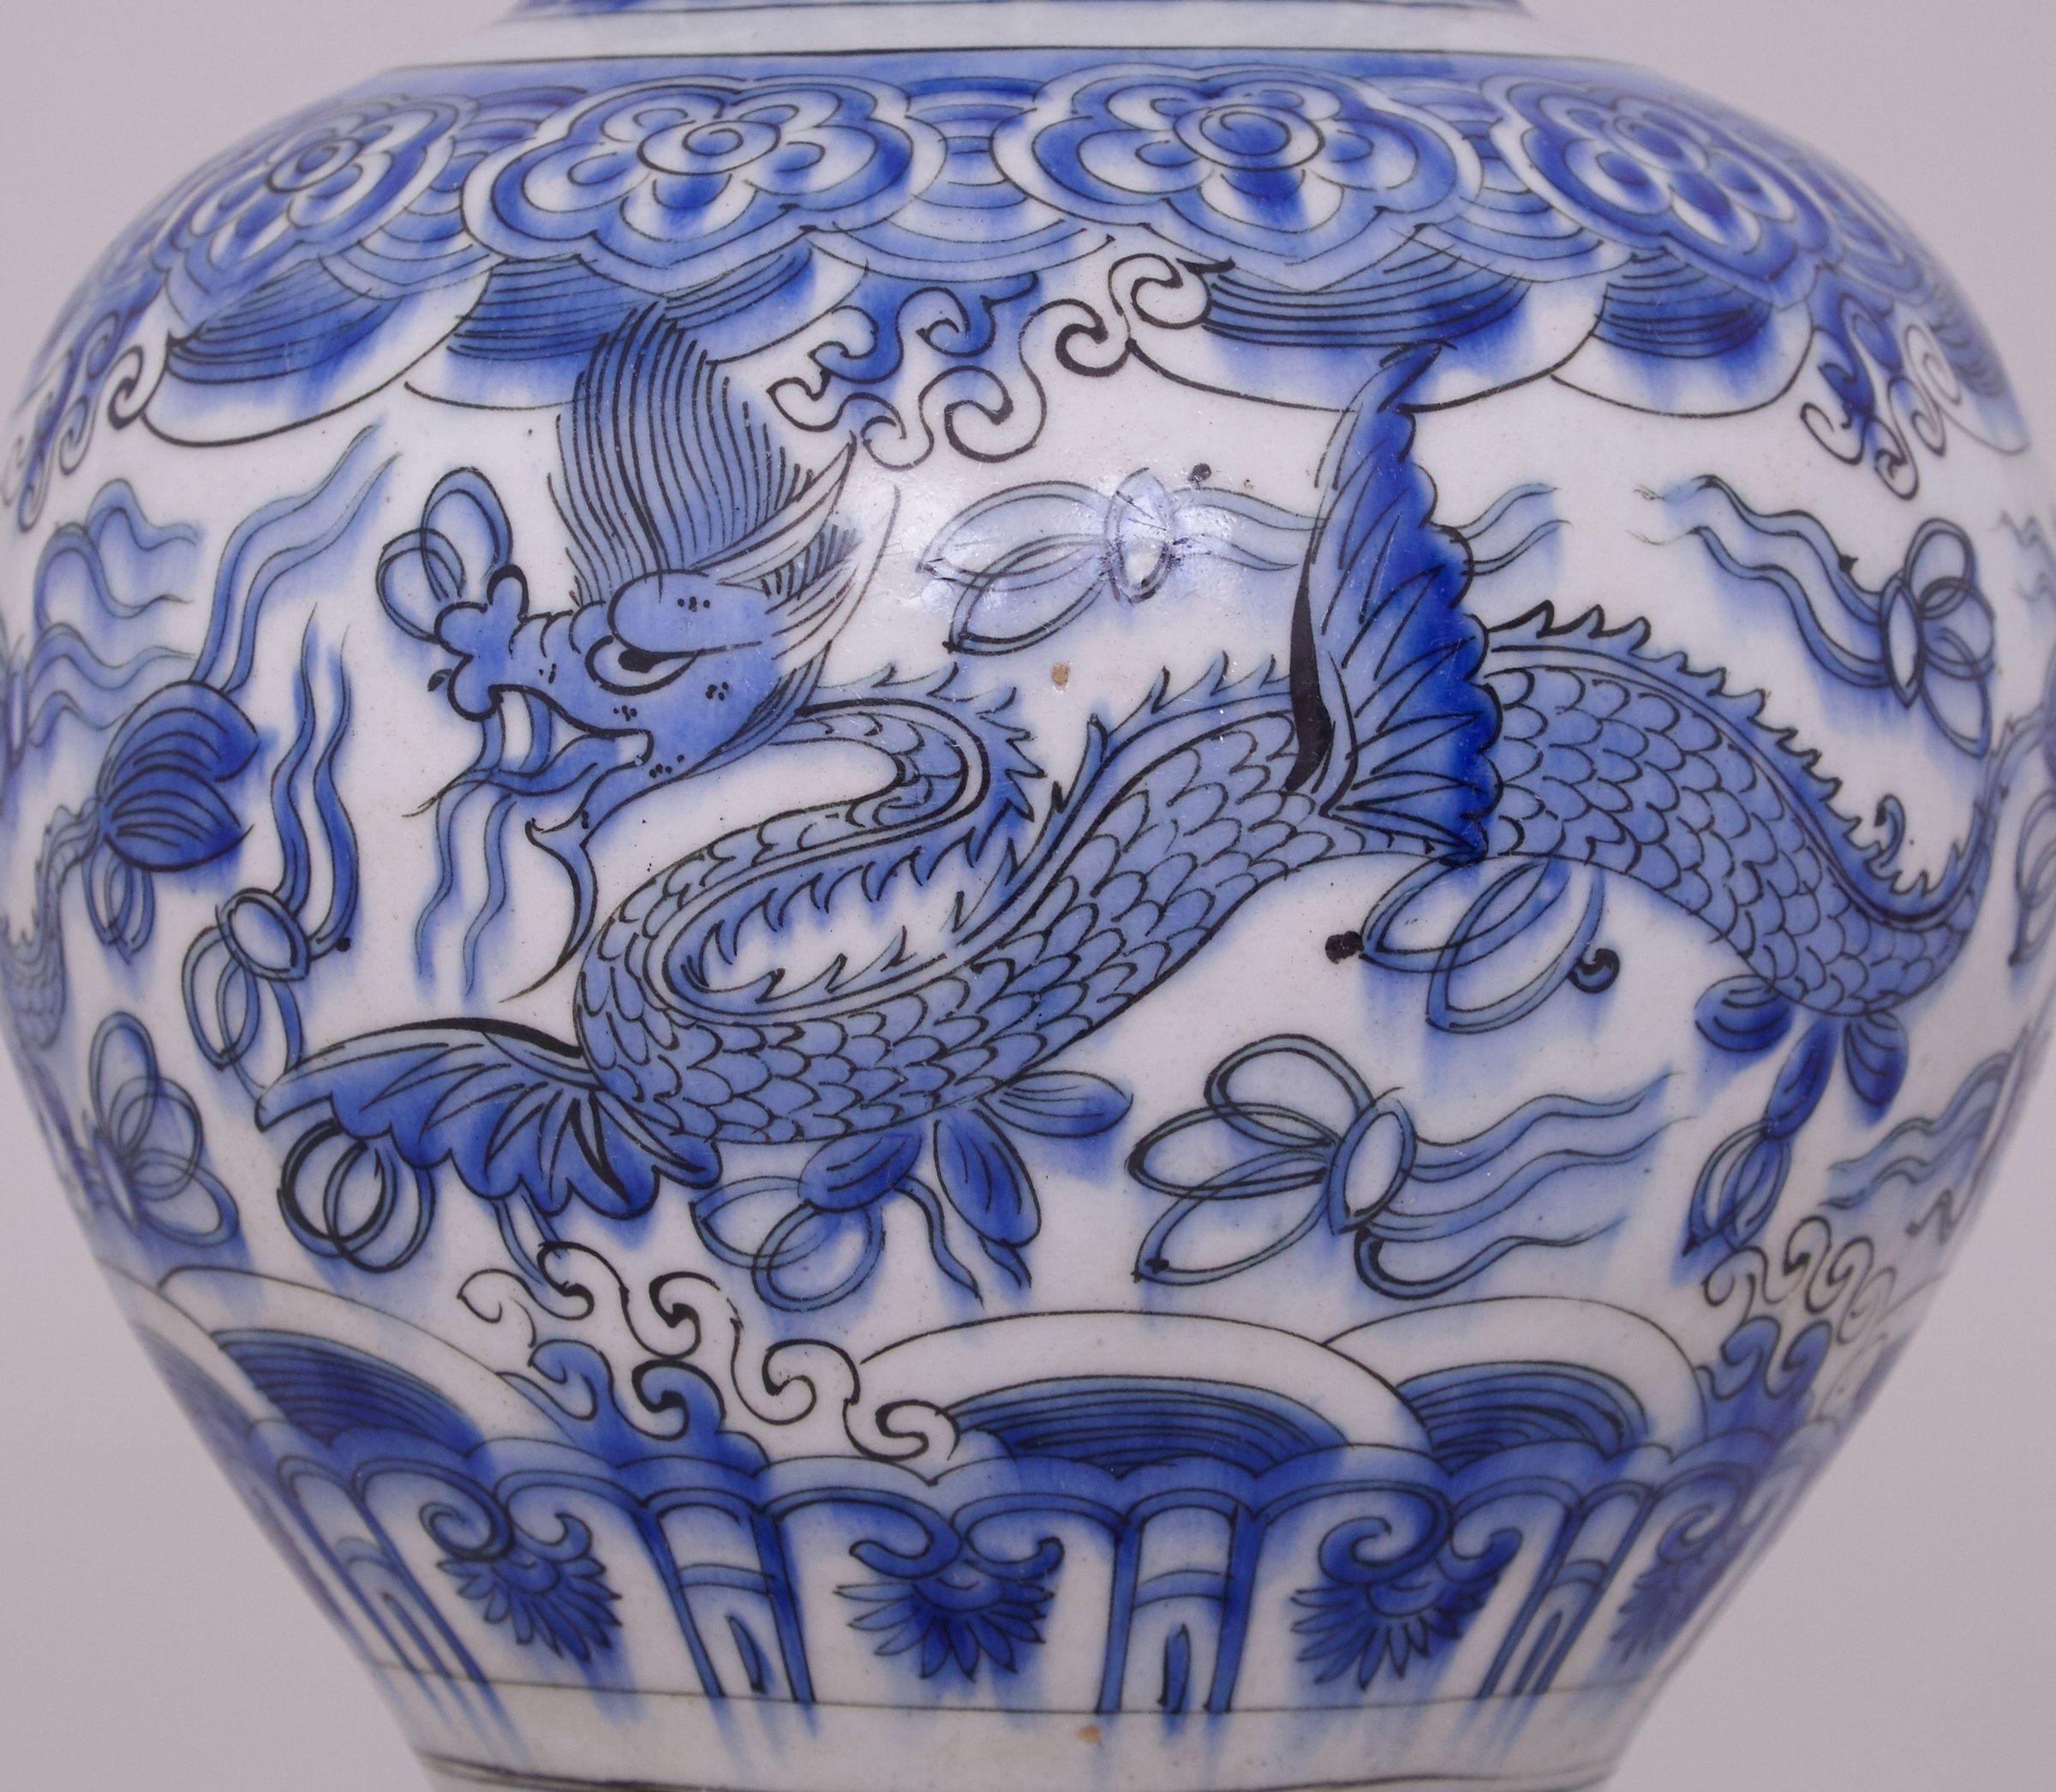 vintage japanese satsuma vase of white pottery vase best of a blue and white persian safavid jar 17th within white pottery vase best of a blue and white persian safavid jar 17th century